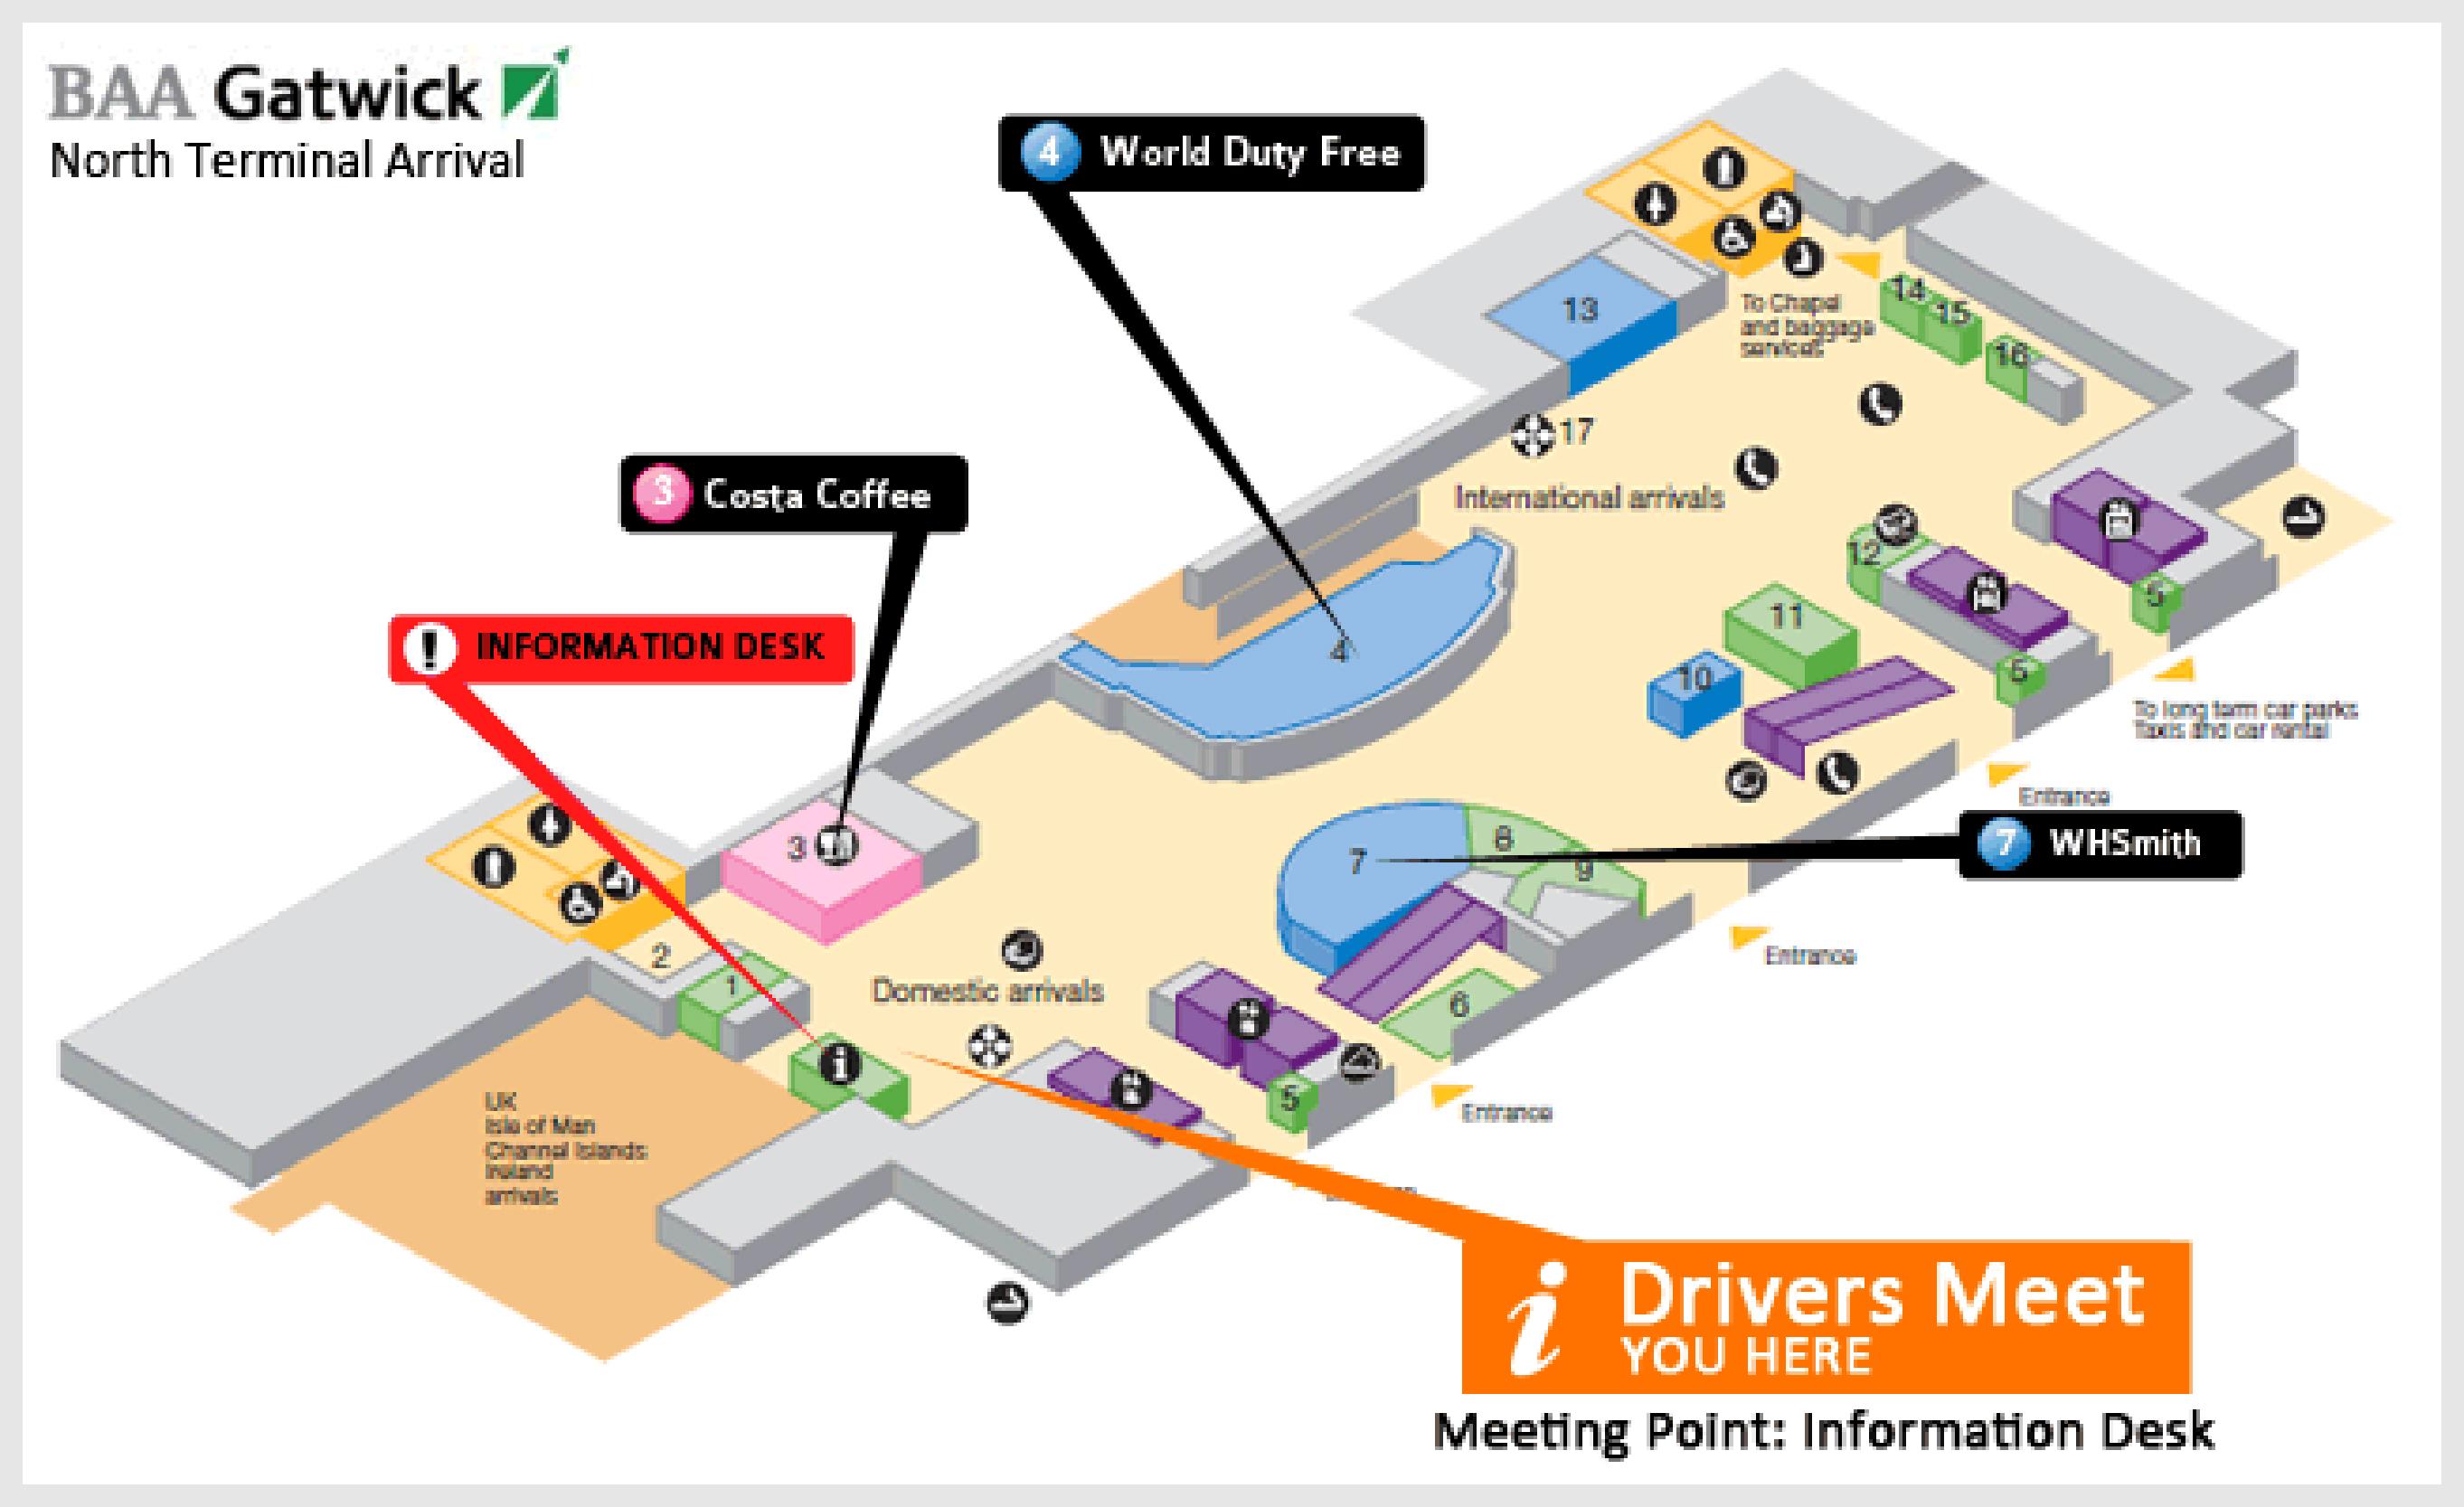 Heathrow Terminal 5 Floor Plan Gatwick Taxi Cab Transfers London To Gatwick Car Service